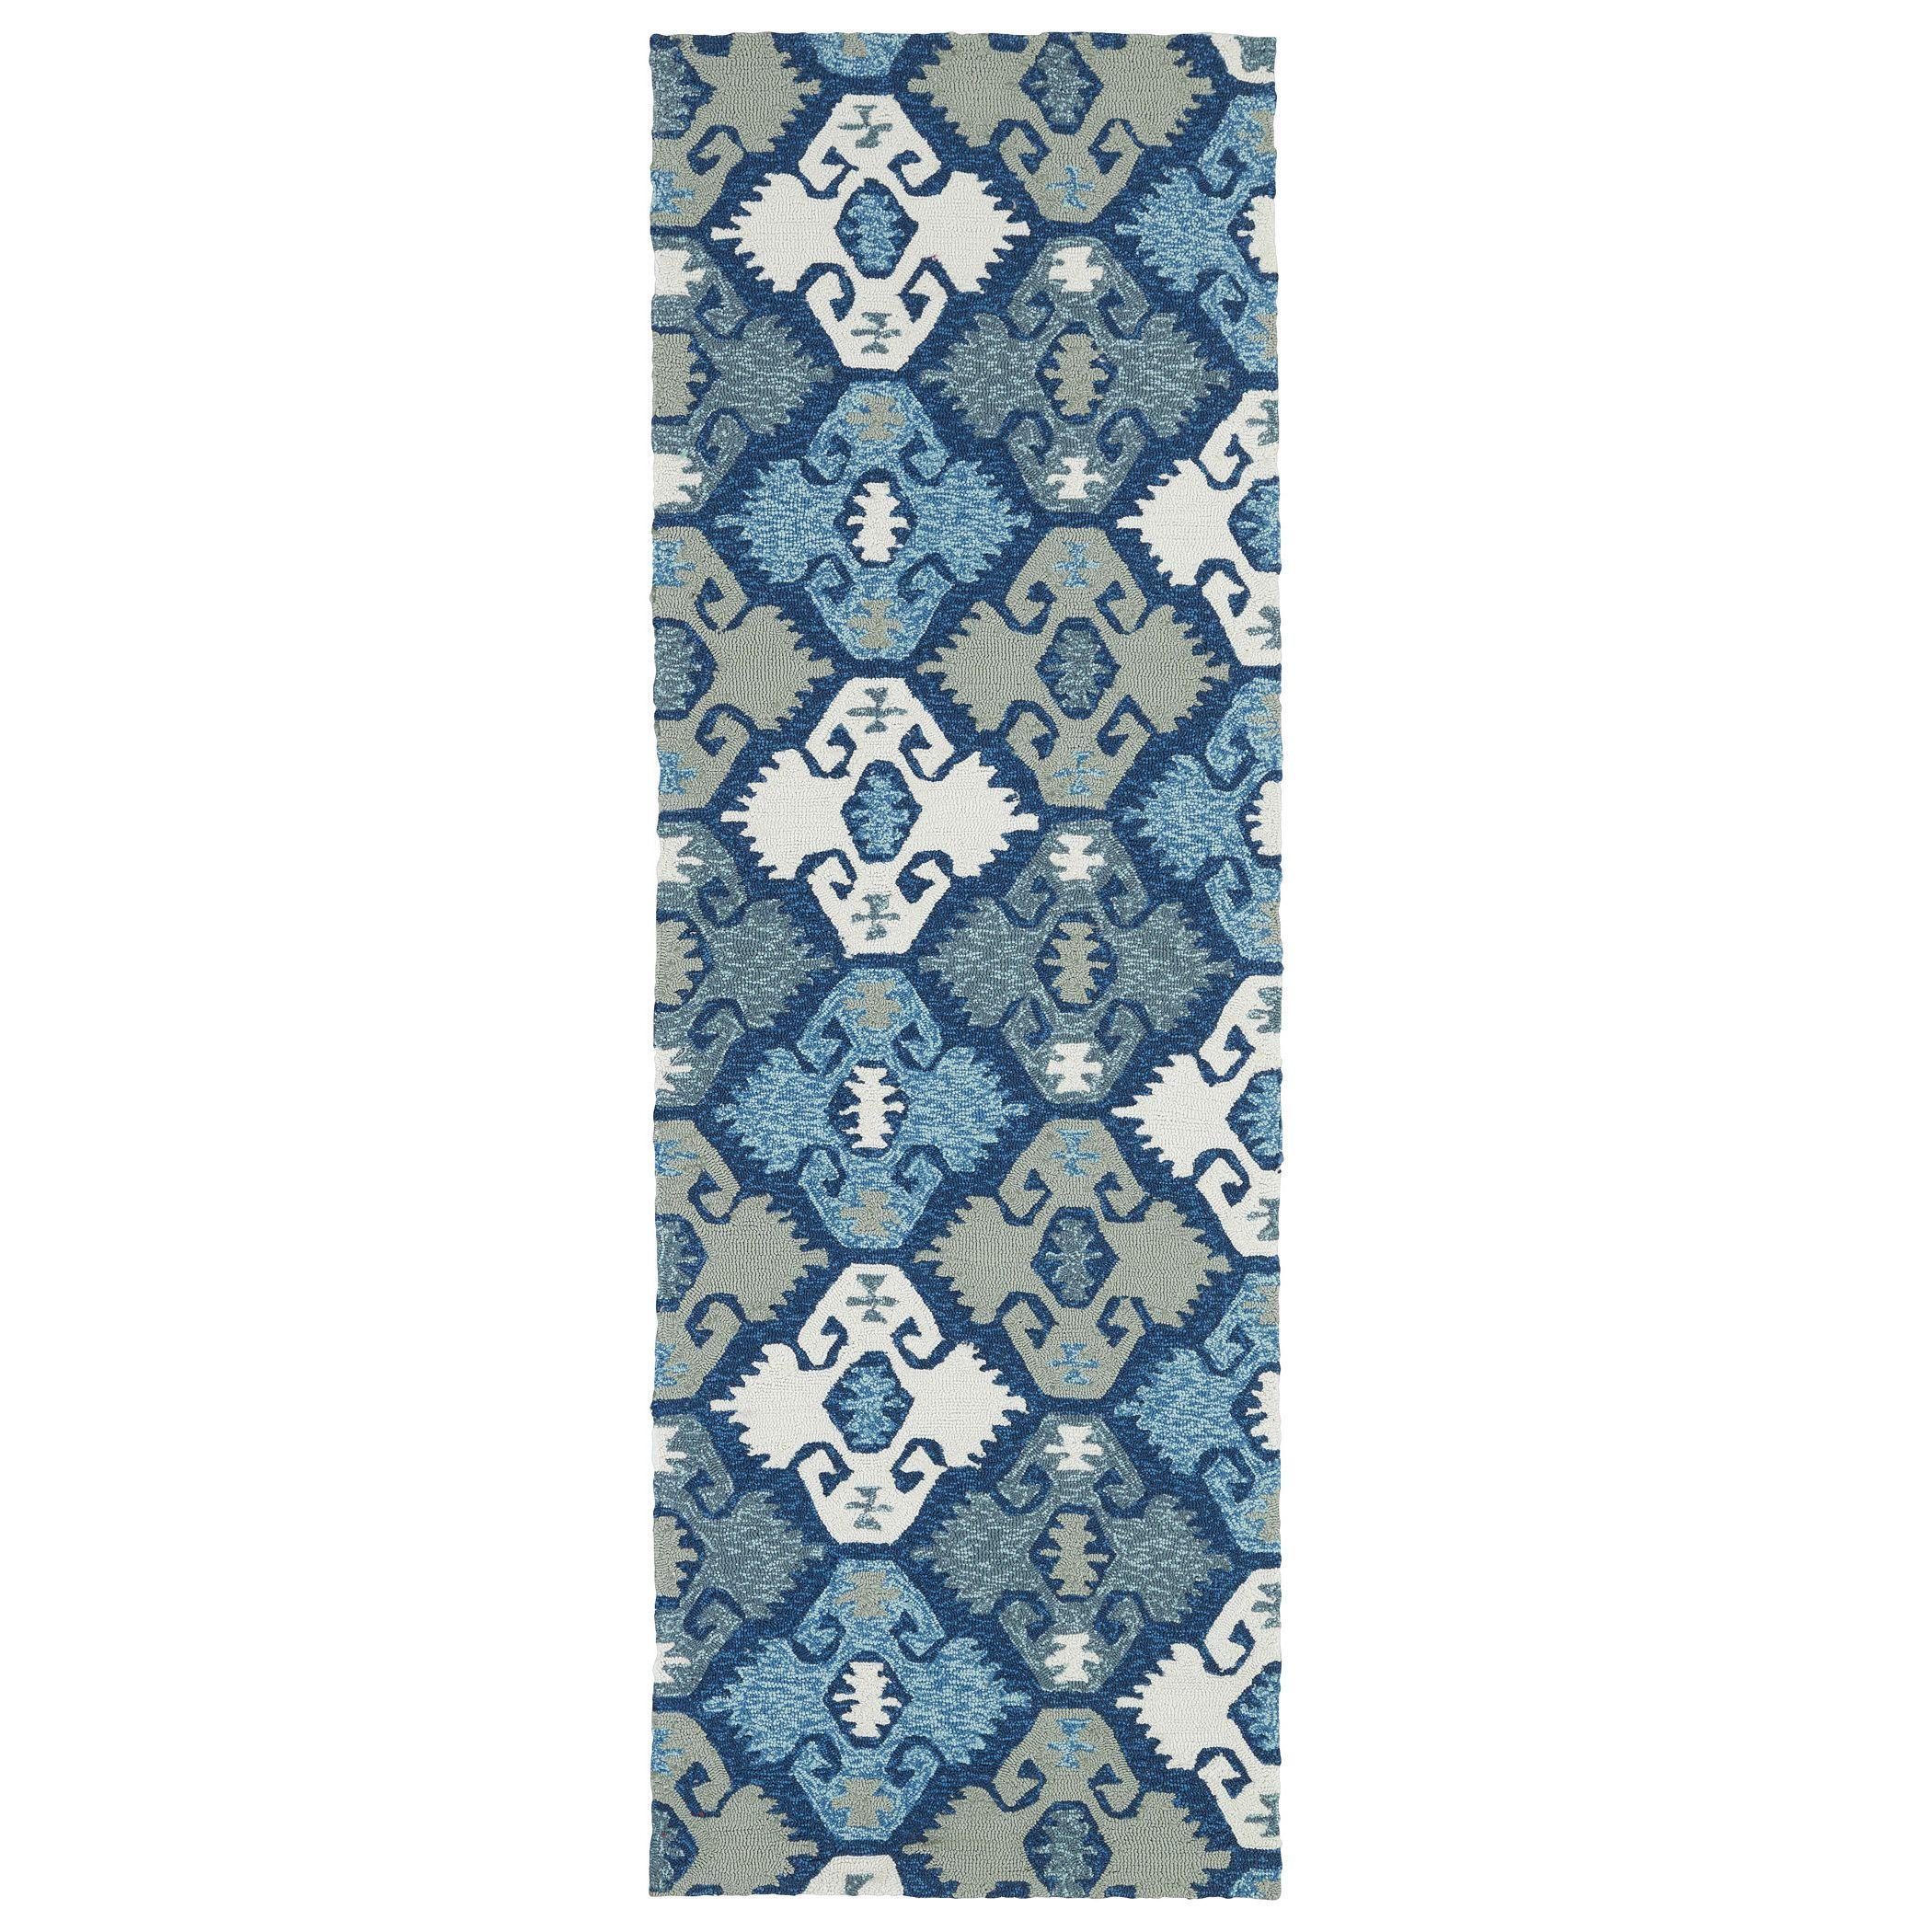 Bombay Home Seaside Blue Nomad Indoor/Outdoor Rug (2\'6 x 8\') (2\'6 x ...